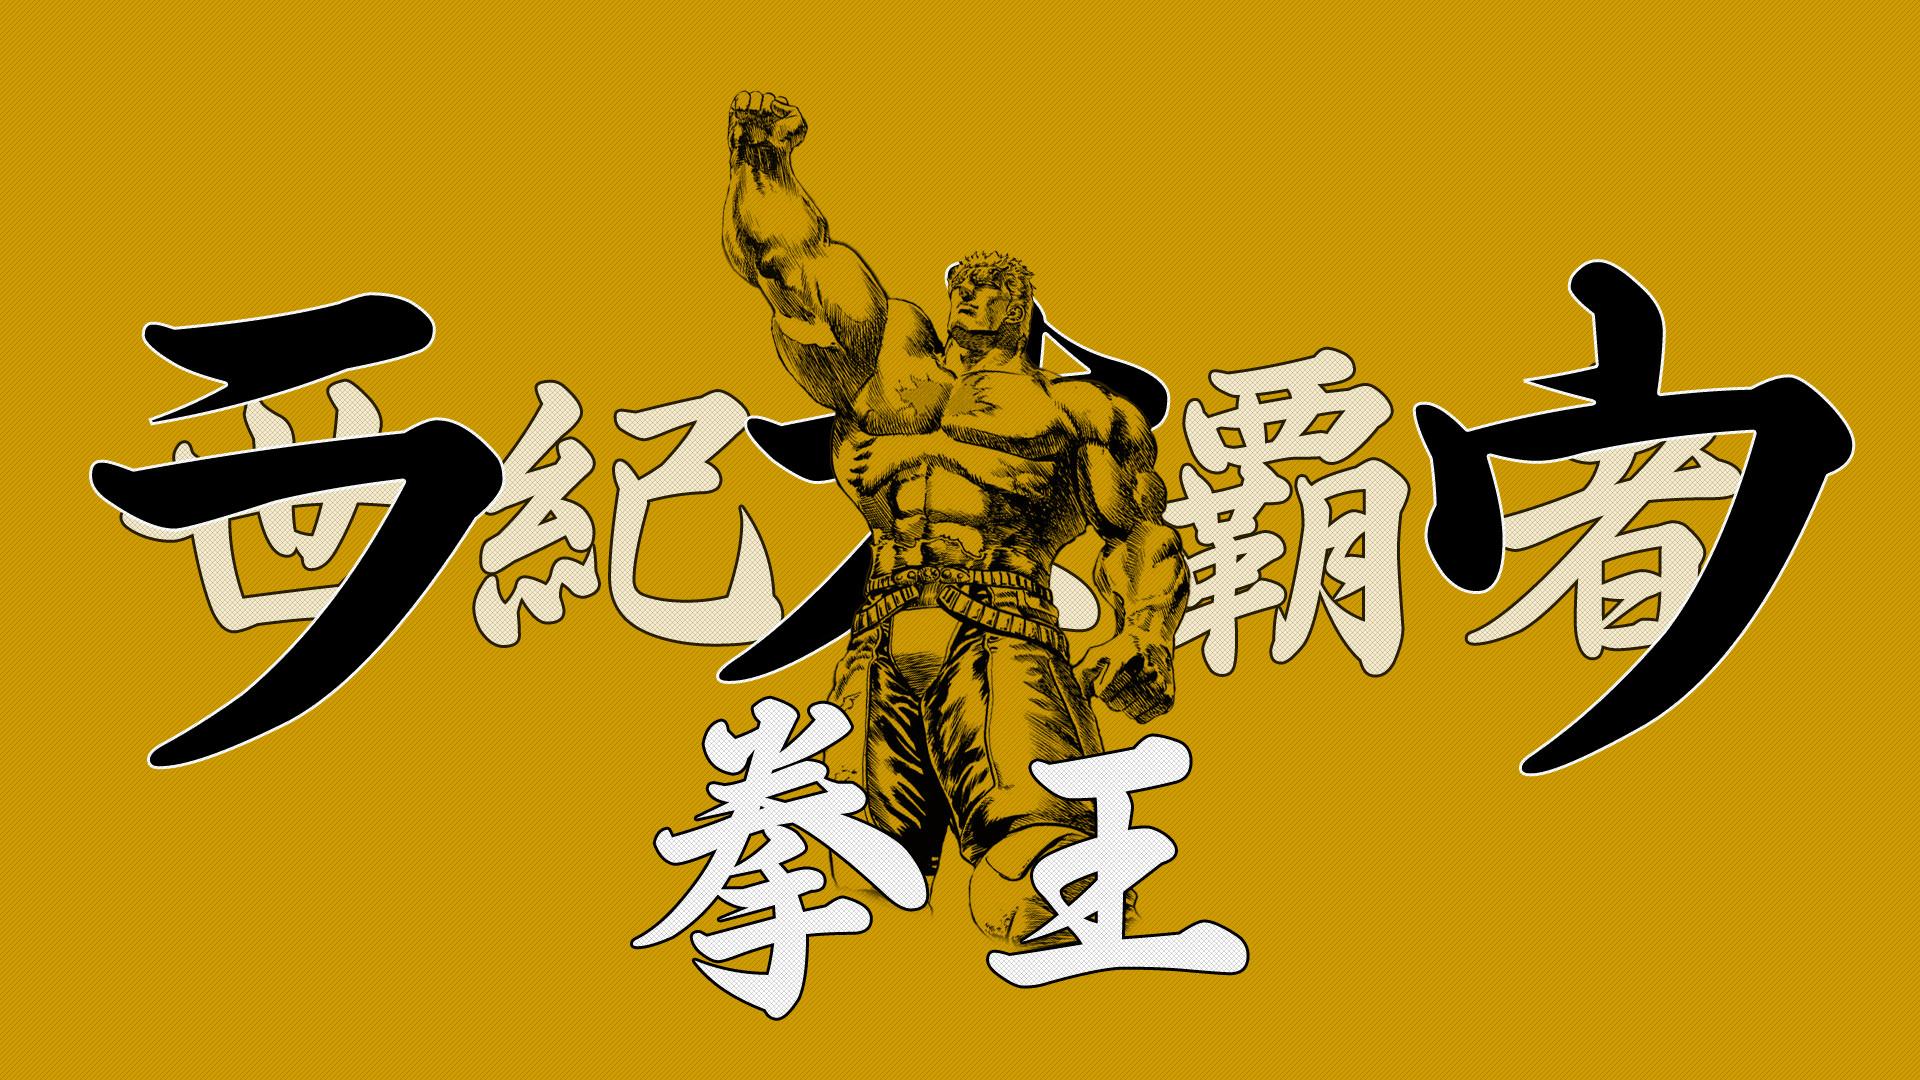 Download Original Wallpaper Category:anime …